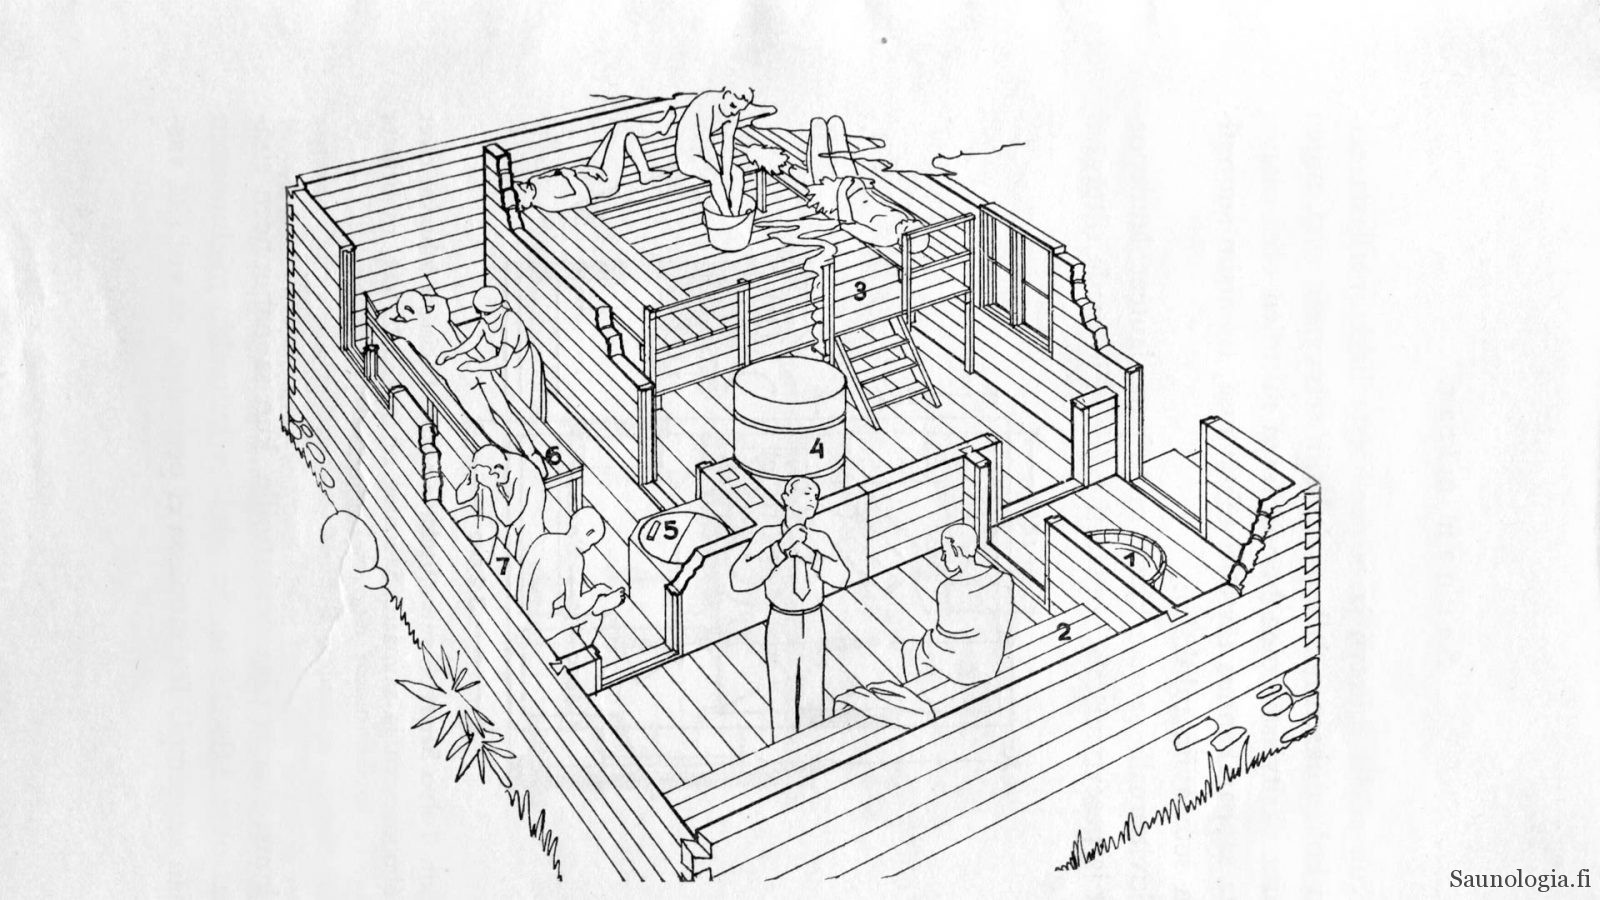 1955-Viherjuuri-Sauna-läpileikkaus